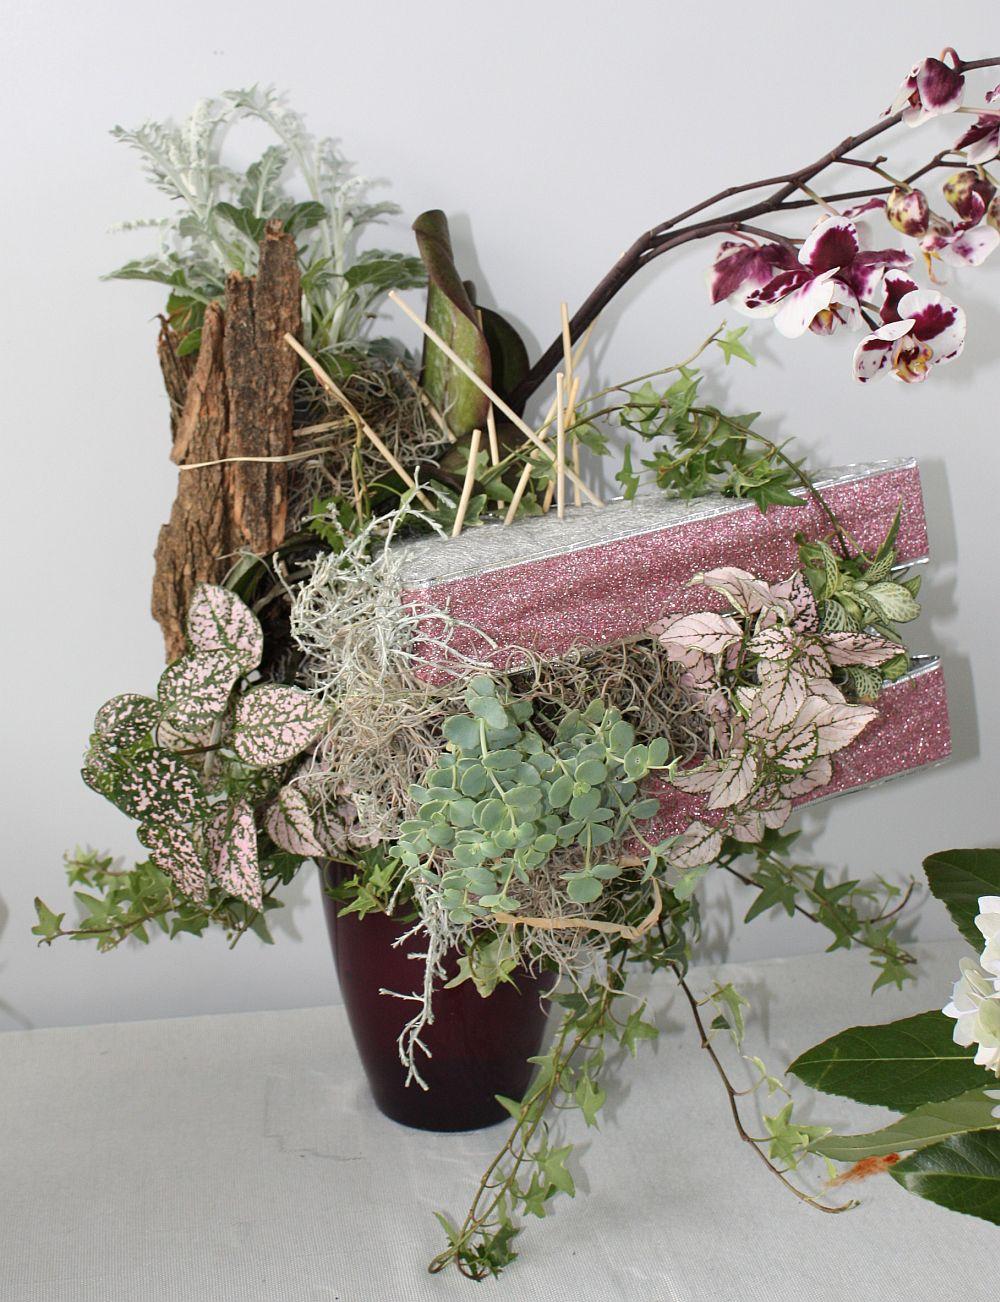 adelaparvu.com despre targul de plante, flori si peisagistica Hartus Florshow 2014 (11)